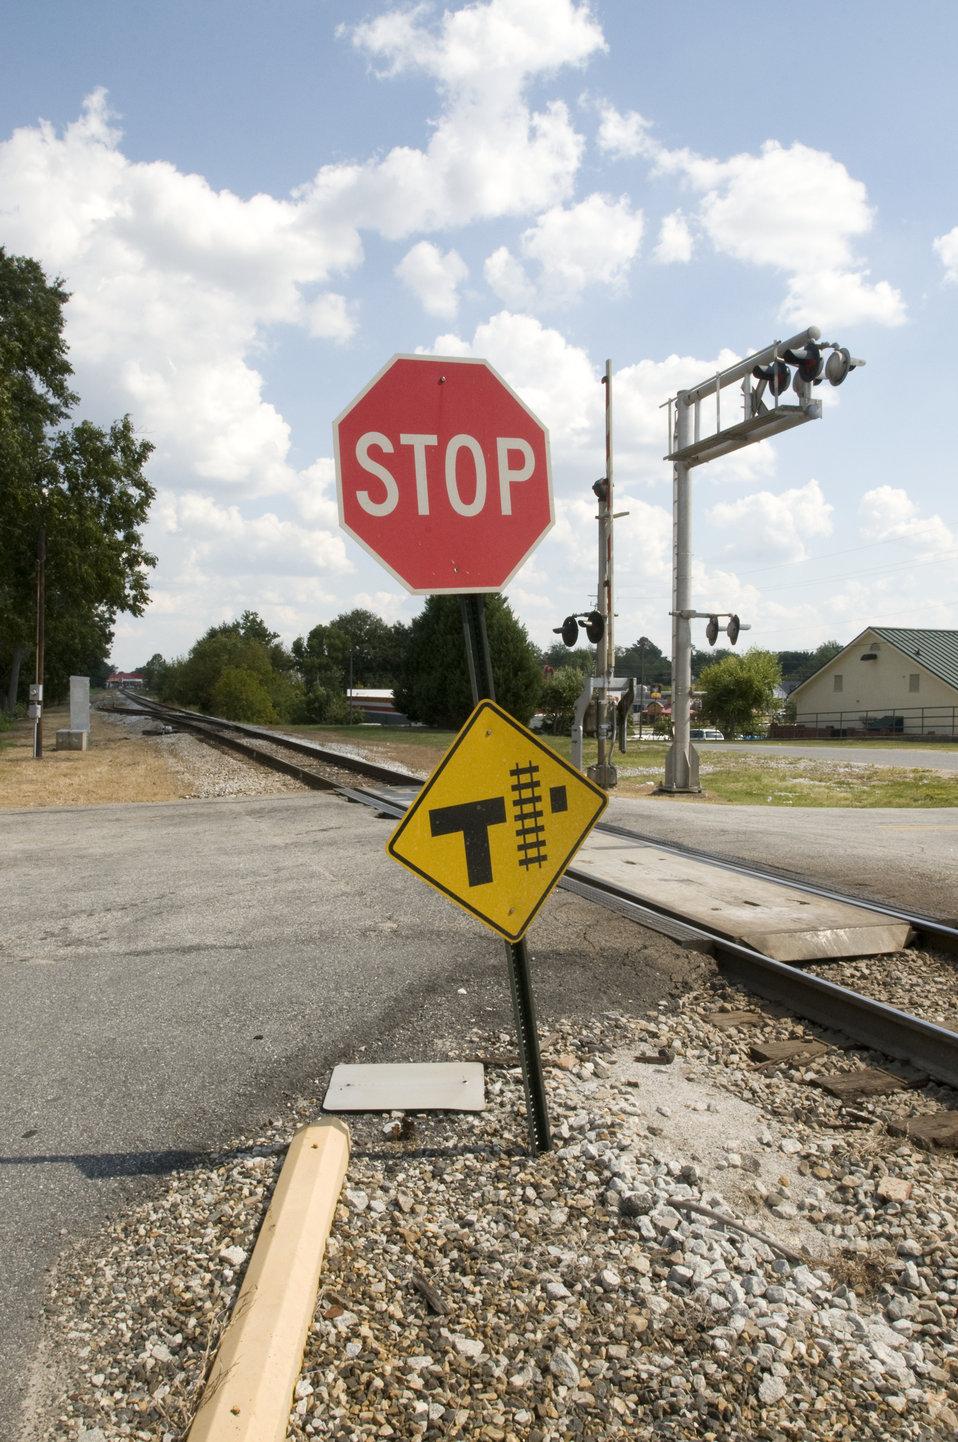 Railroad crossing traffic signs